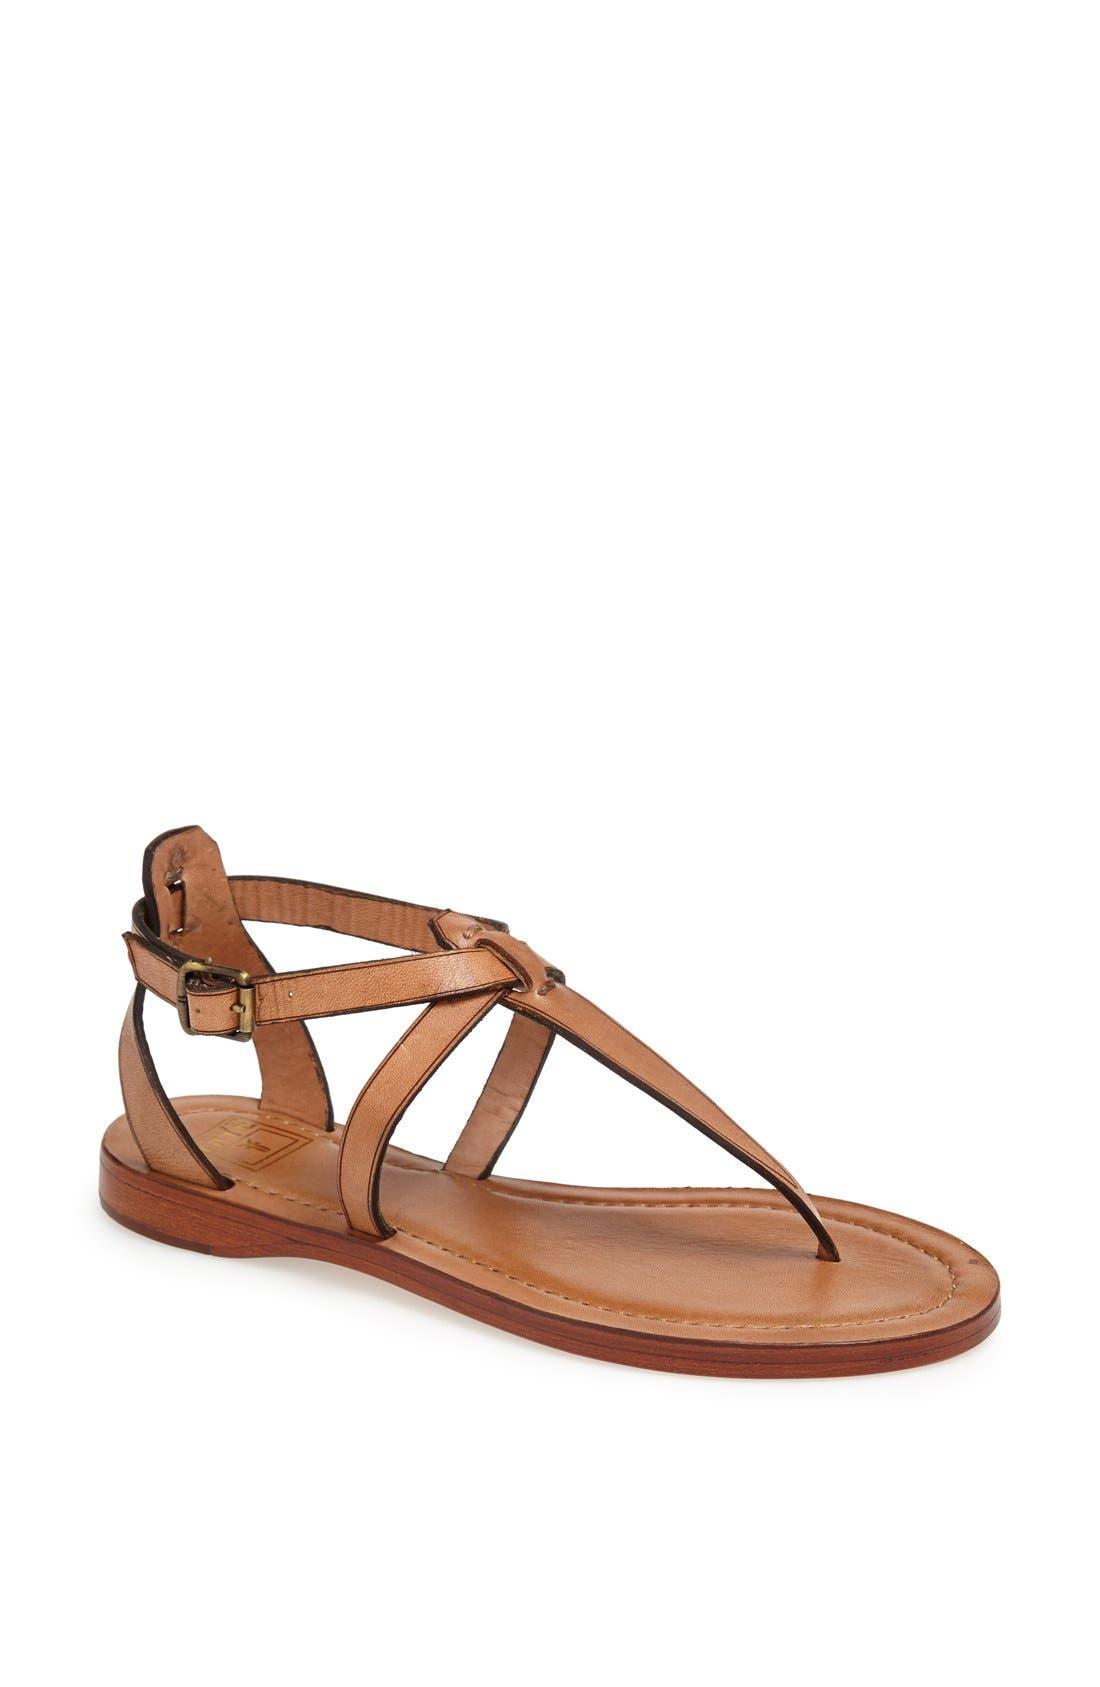 Alternate Image 1 Selected - Frye 'Rachel' T-Strap Sandal (Women)